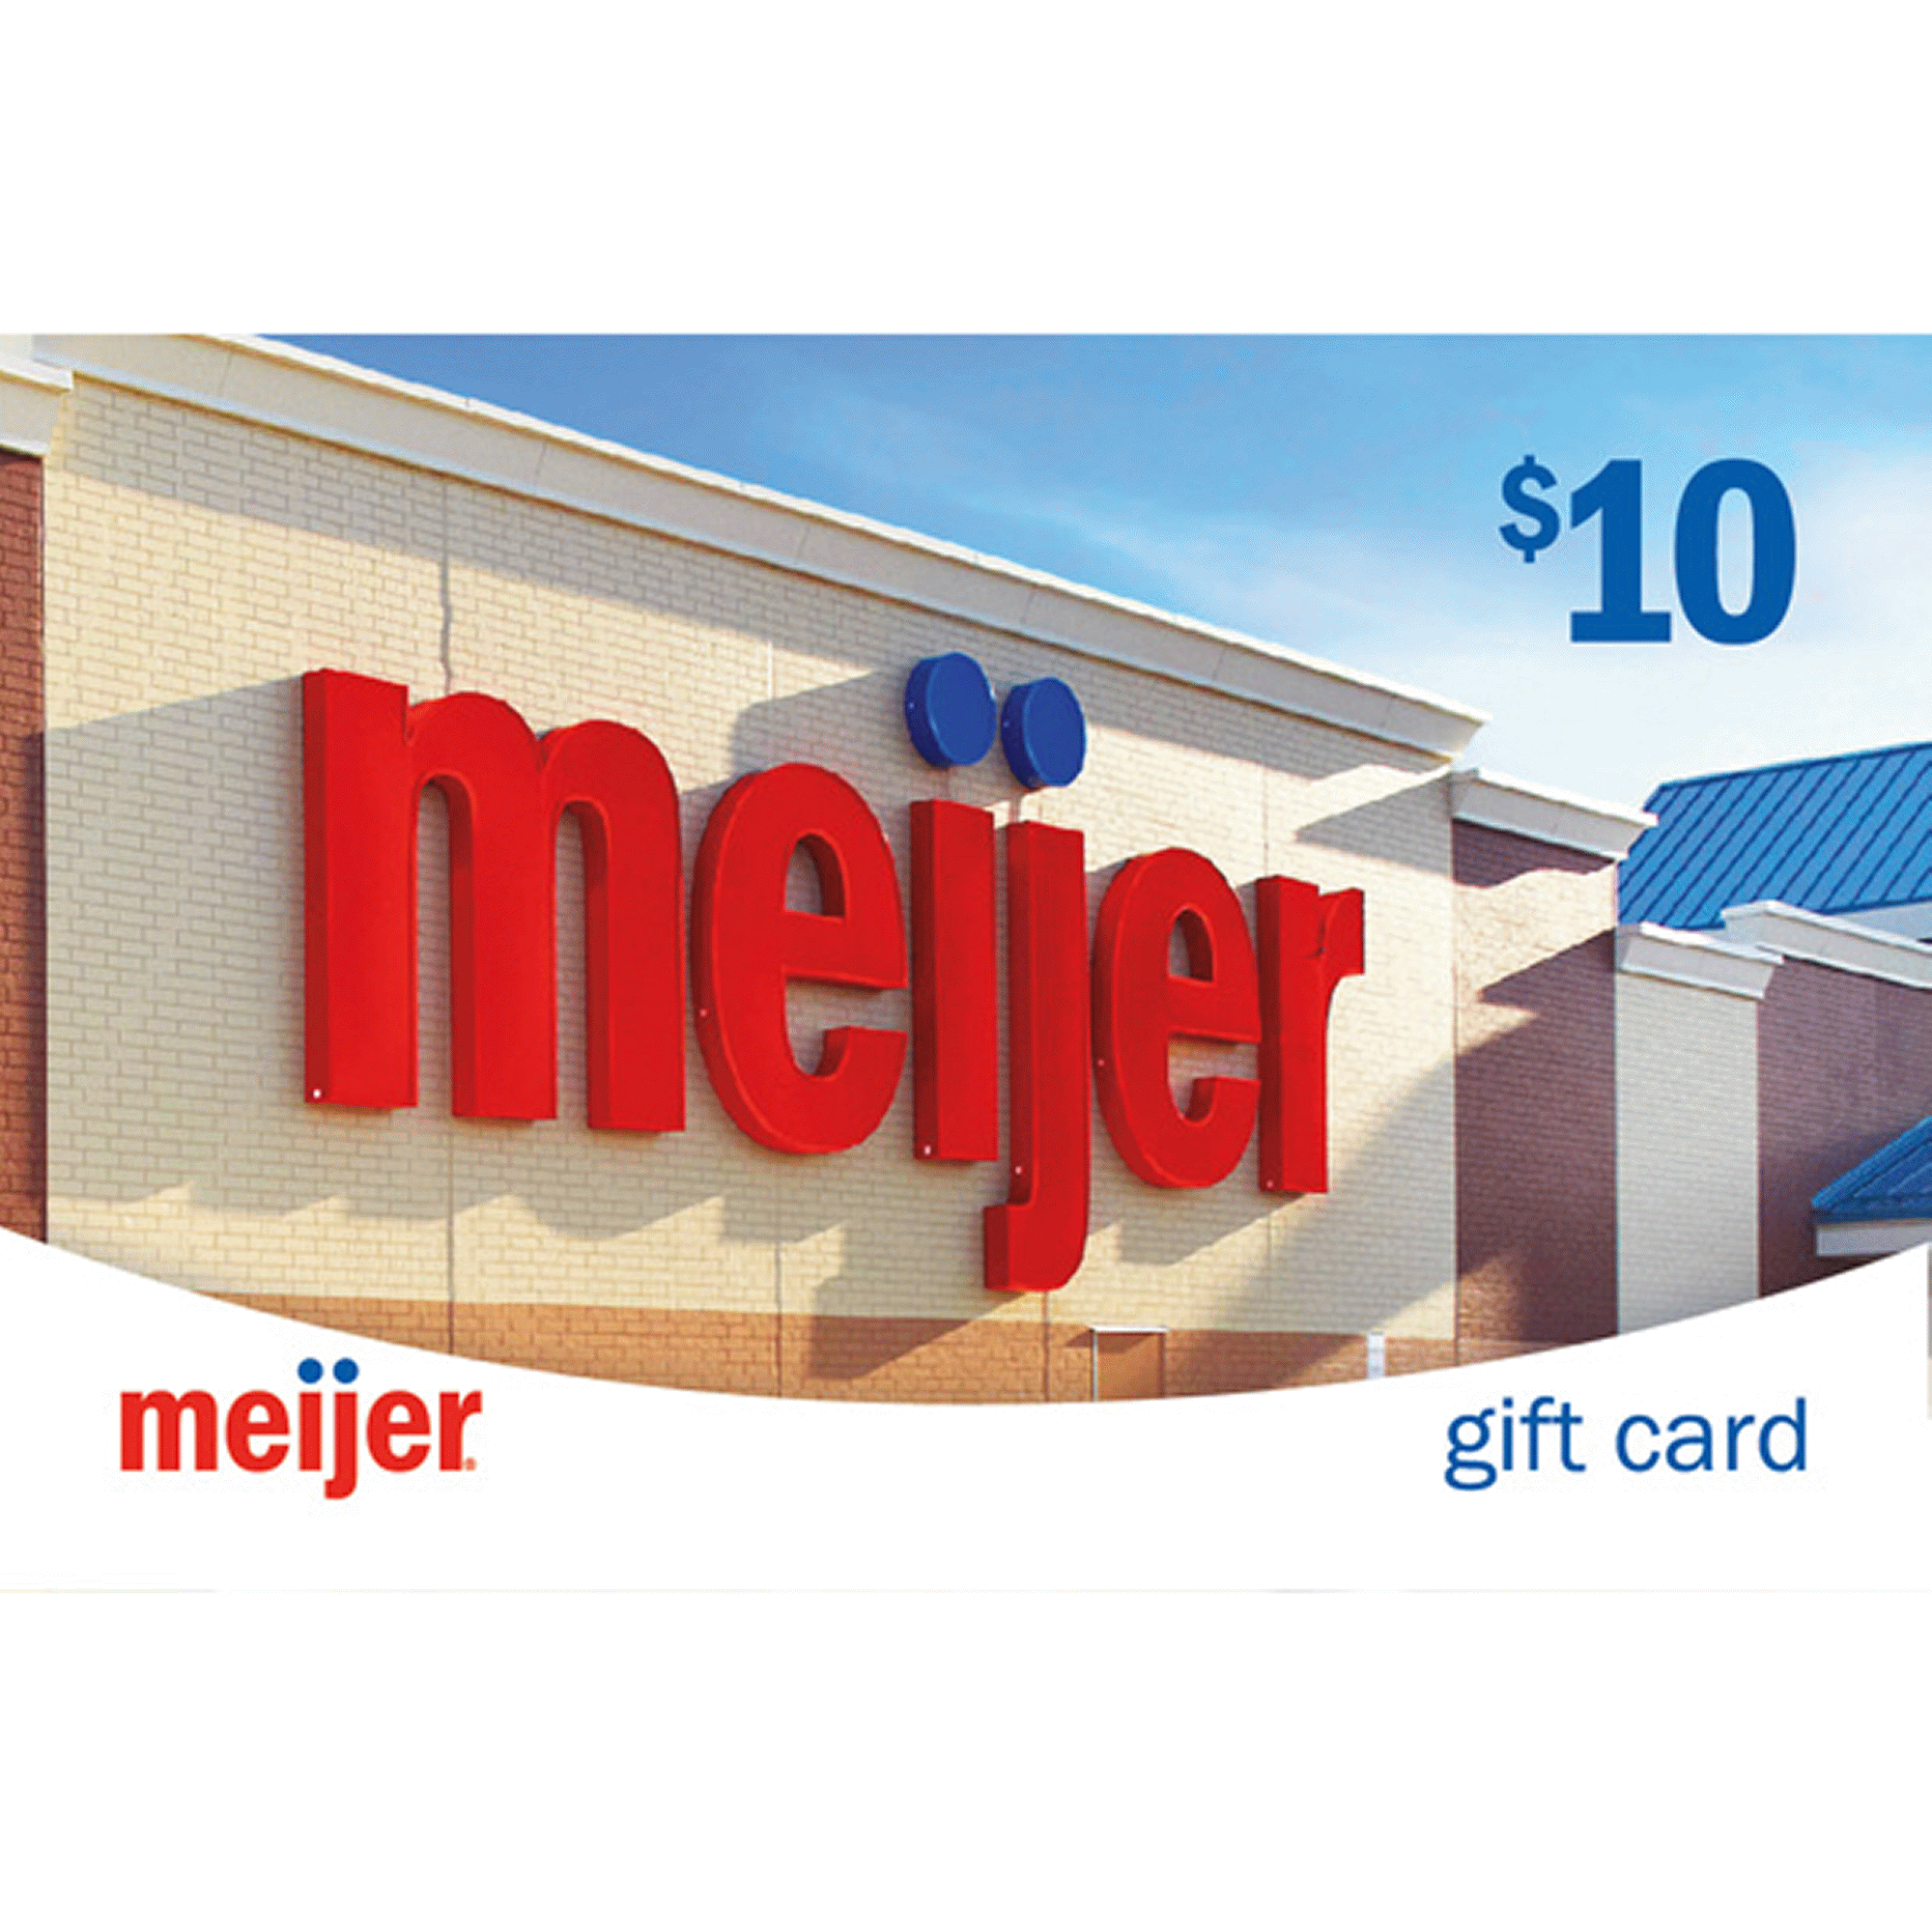 Meijer Gift Cards | Meijer.com